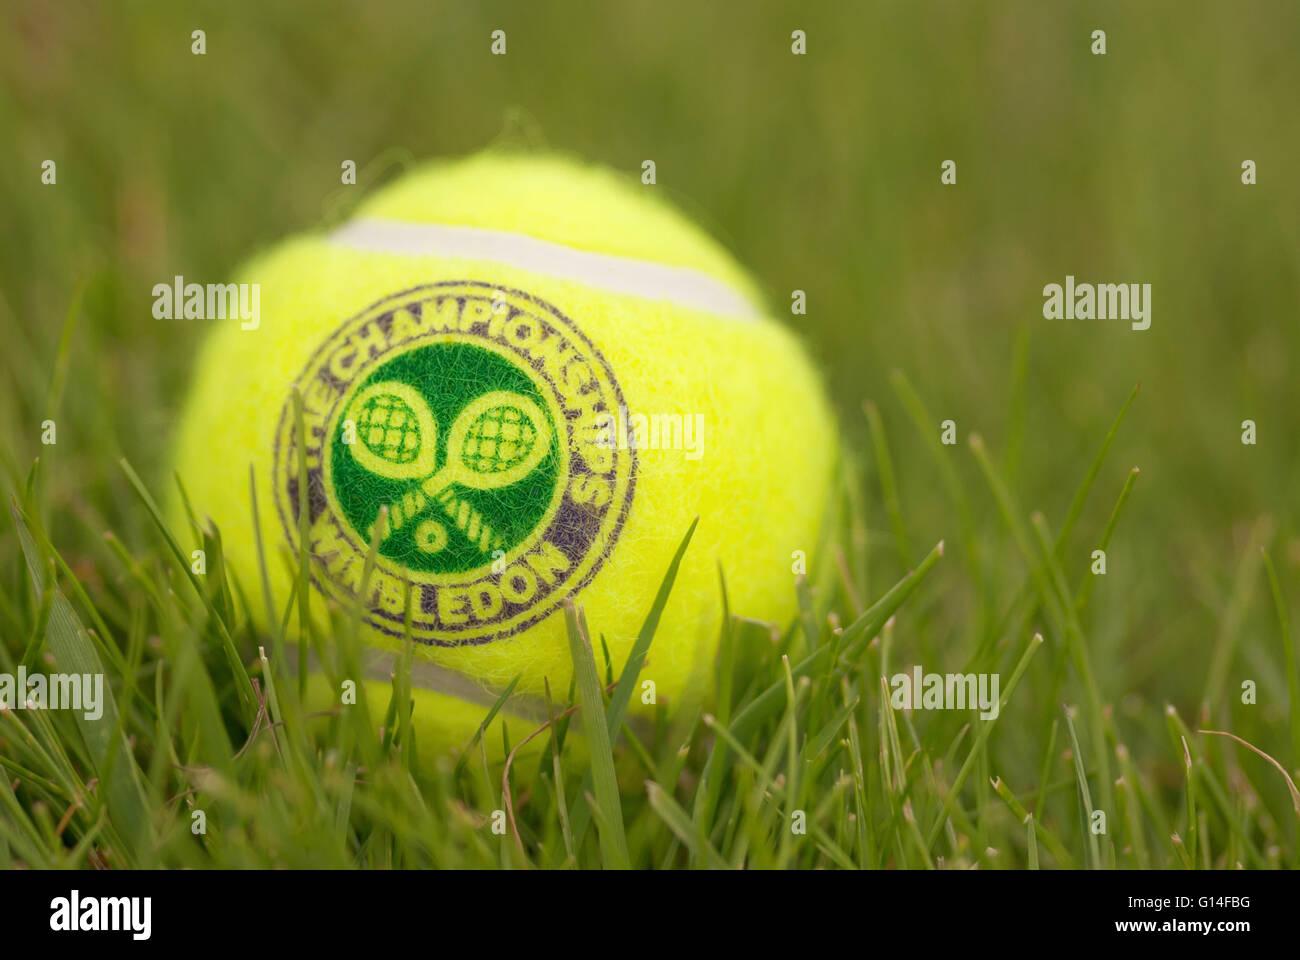 Londres, Inglaterra, el 22 de junio, 2009: pelota de tenis tradidional oficial para el torneo de Wimbledon, Londres, Reino Unido. Foto de stock